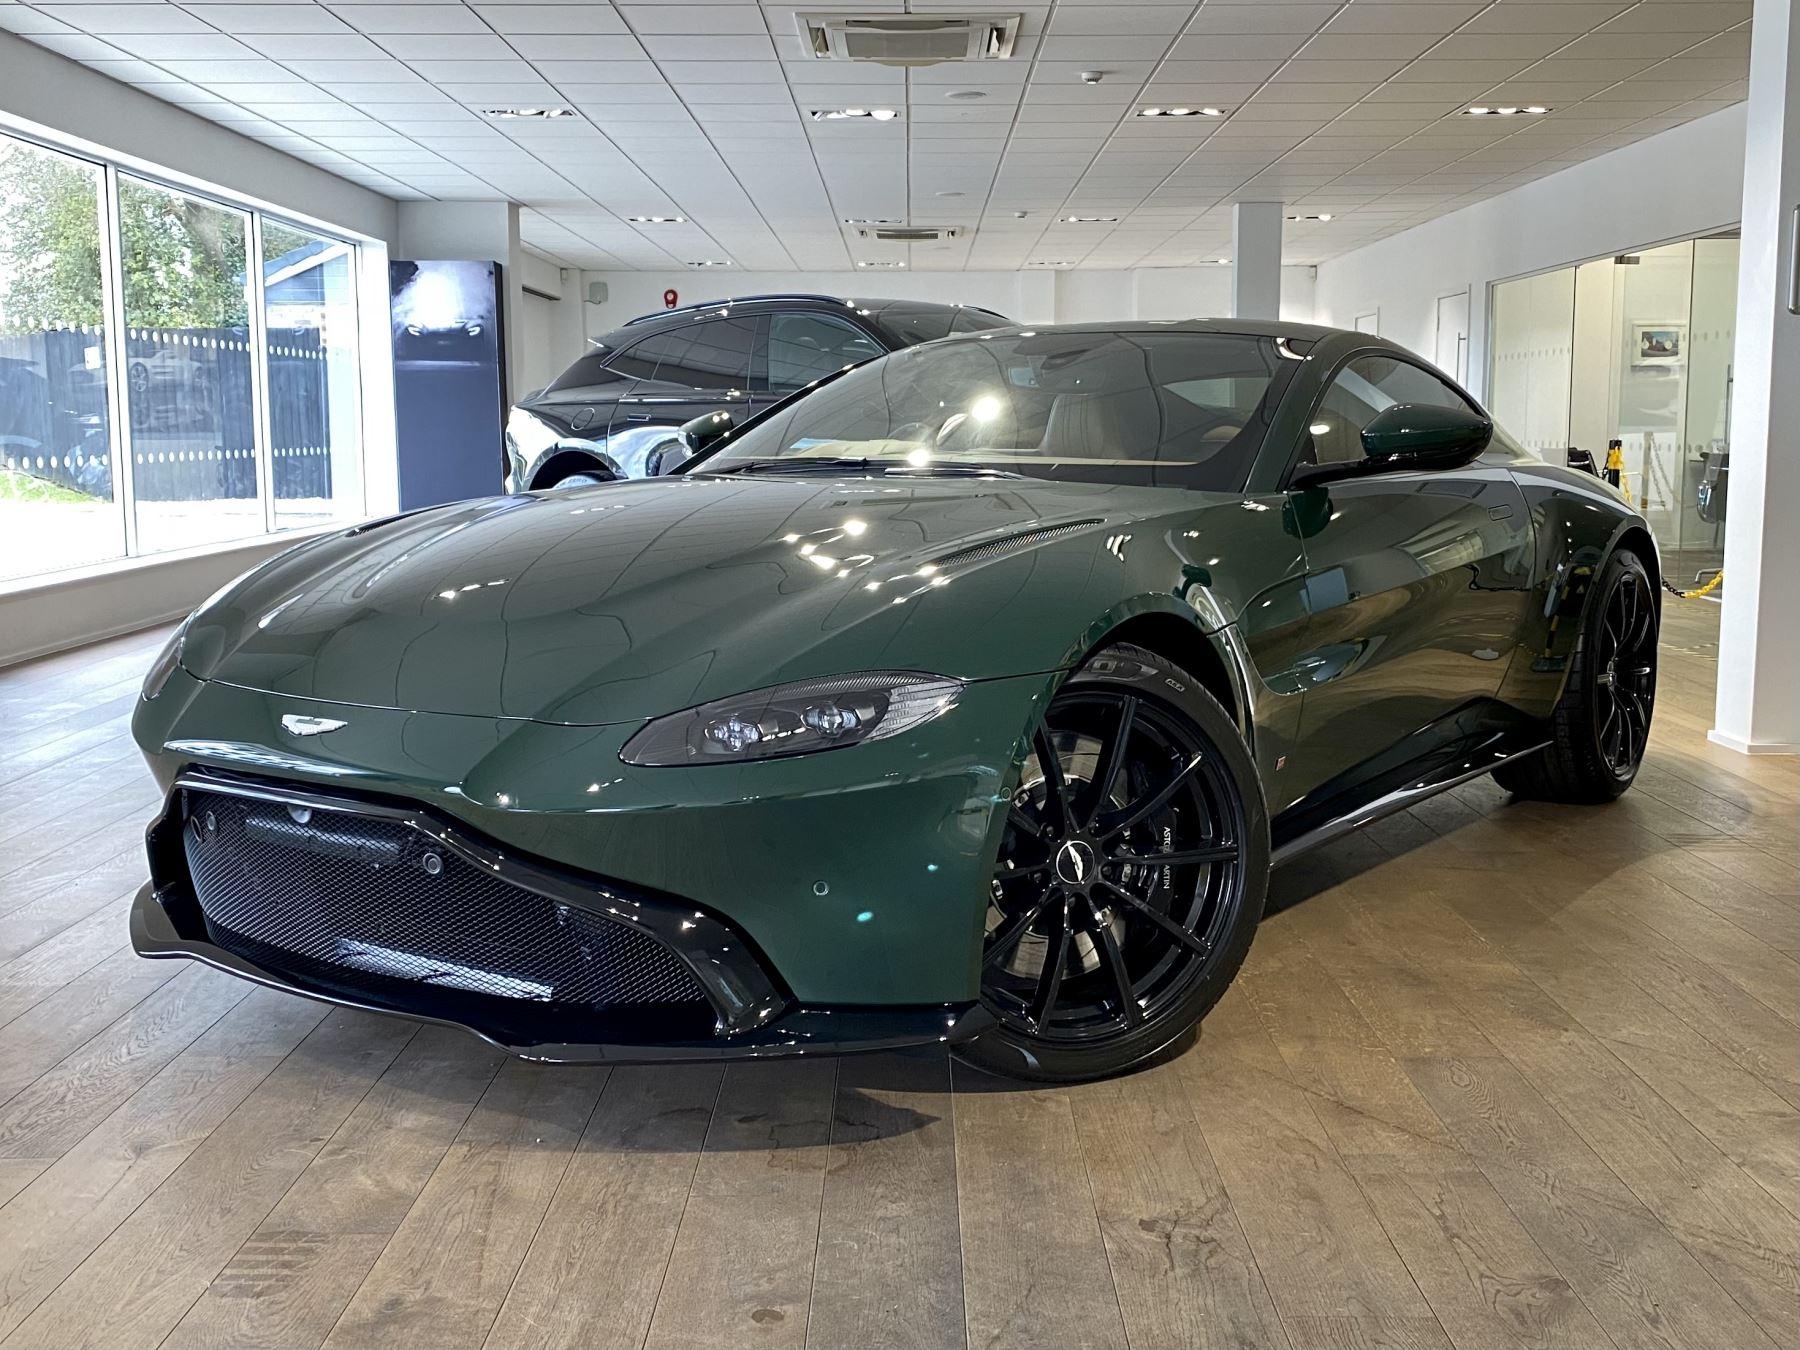 Aston Martin New Vantage ZF 8 Speed Auto 4.0 Automatic 2 door Coupe